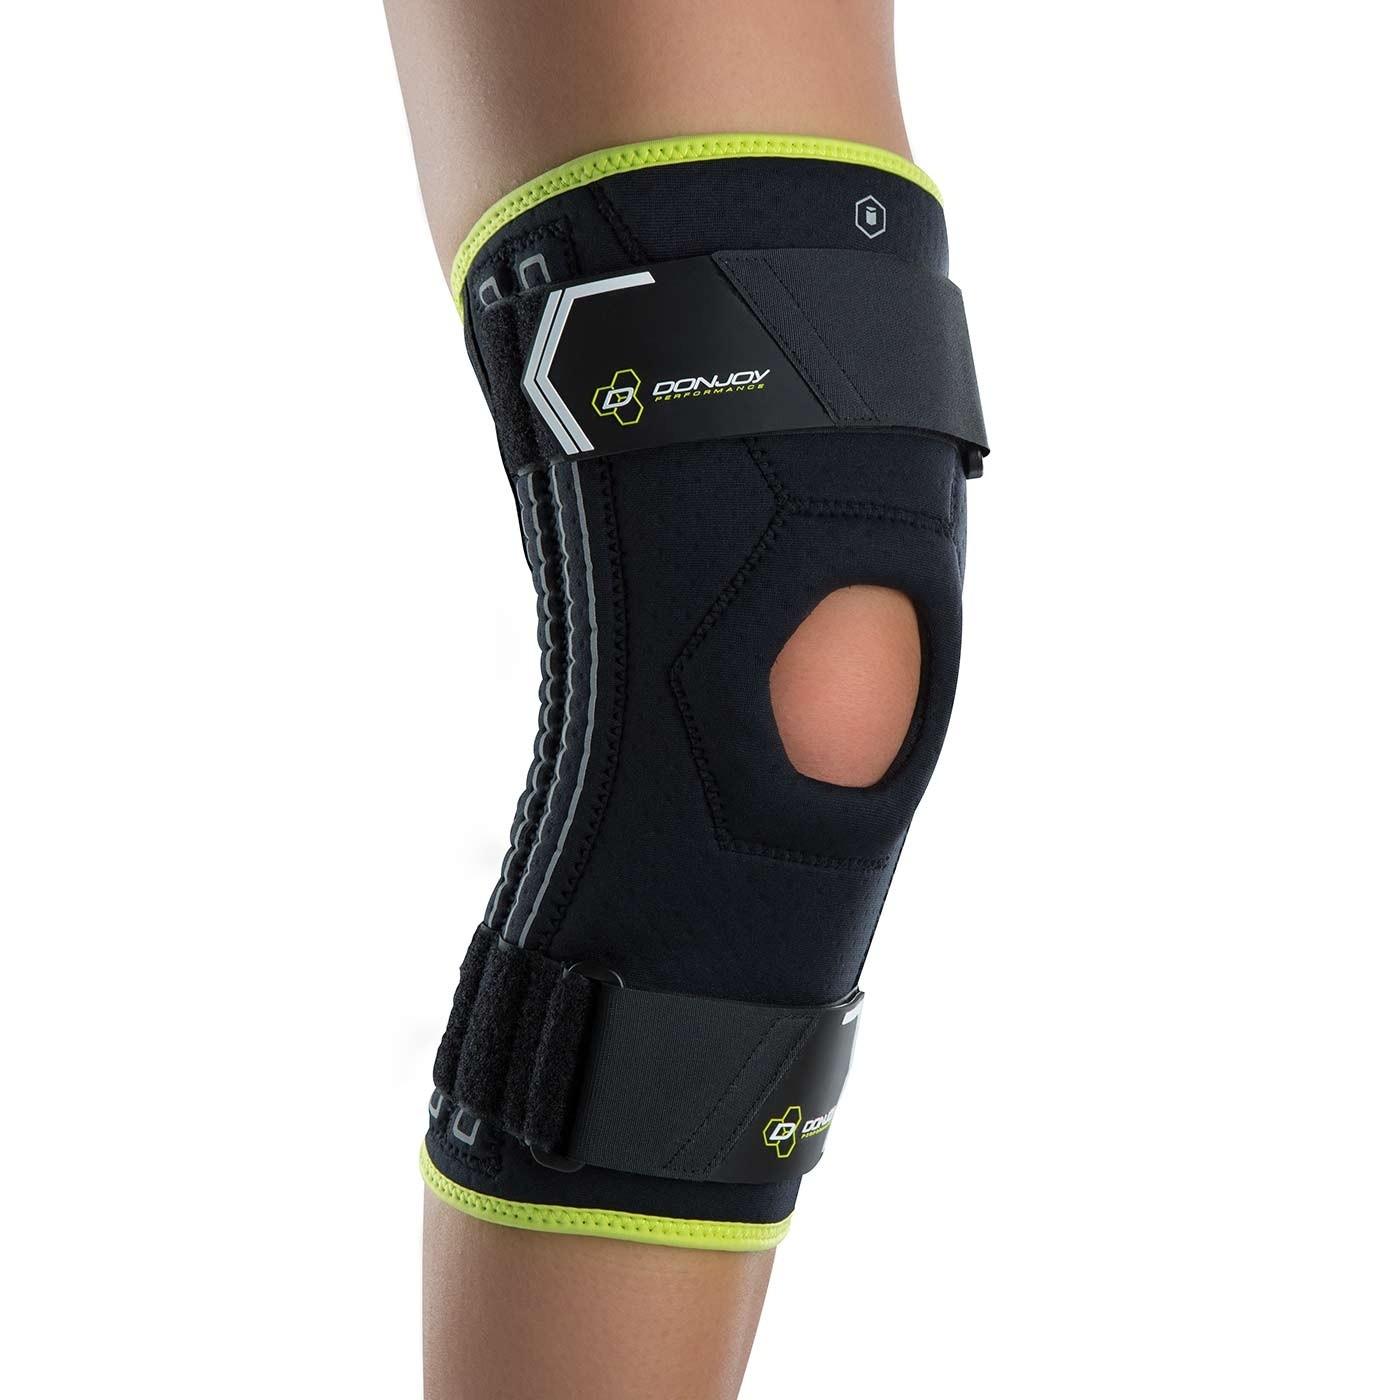 102b1953c4 DonJoy Performance Stabilizing Knee Sleeve